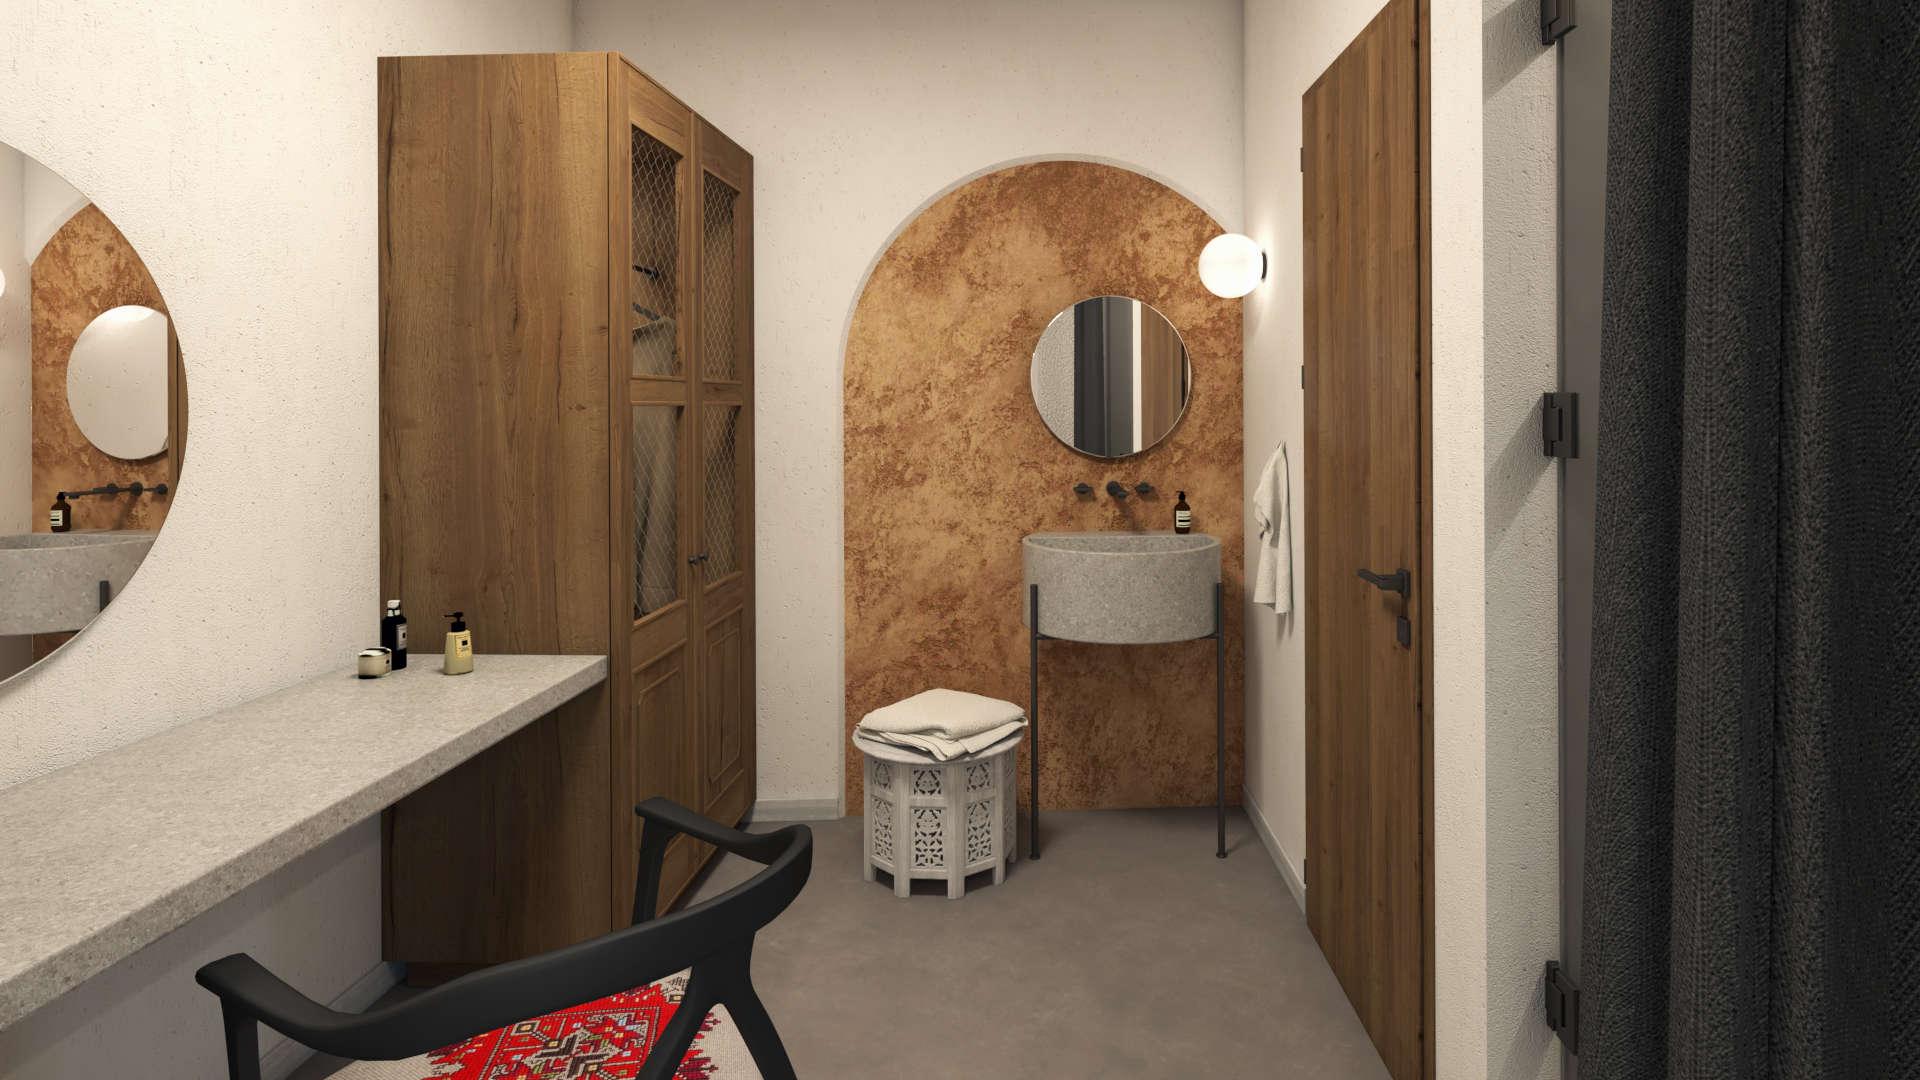 Hotel in a village,suite, interior design, bathroom ante room, dressing table,wardrobe and sink area. Τουριστικό κατάλυμα σε οικισμό, σουίτα, προθάλαμος μπάνιου, ντουλάπα, γραφείο και νιπτήρας.